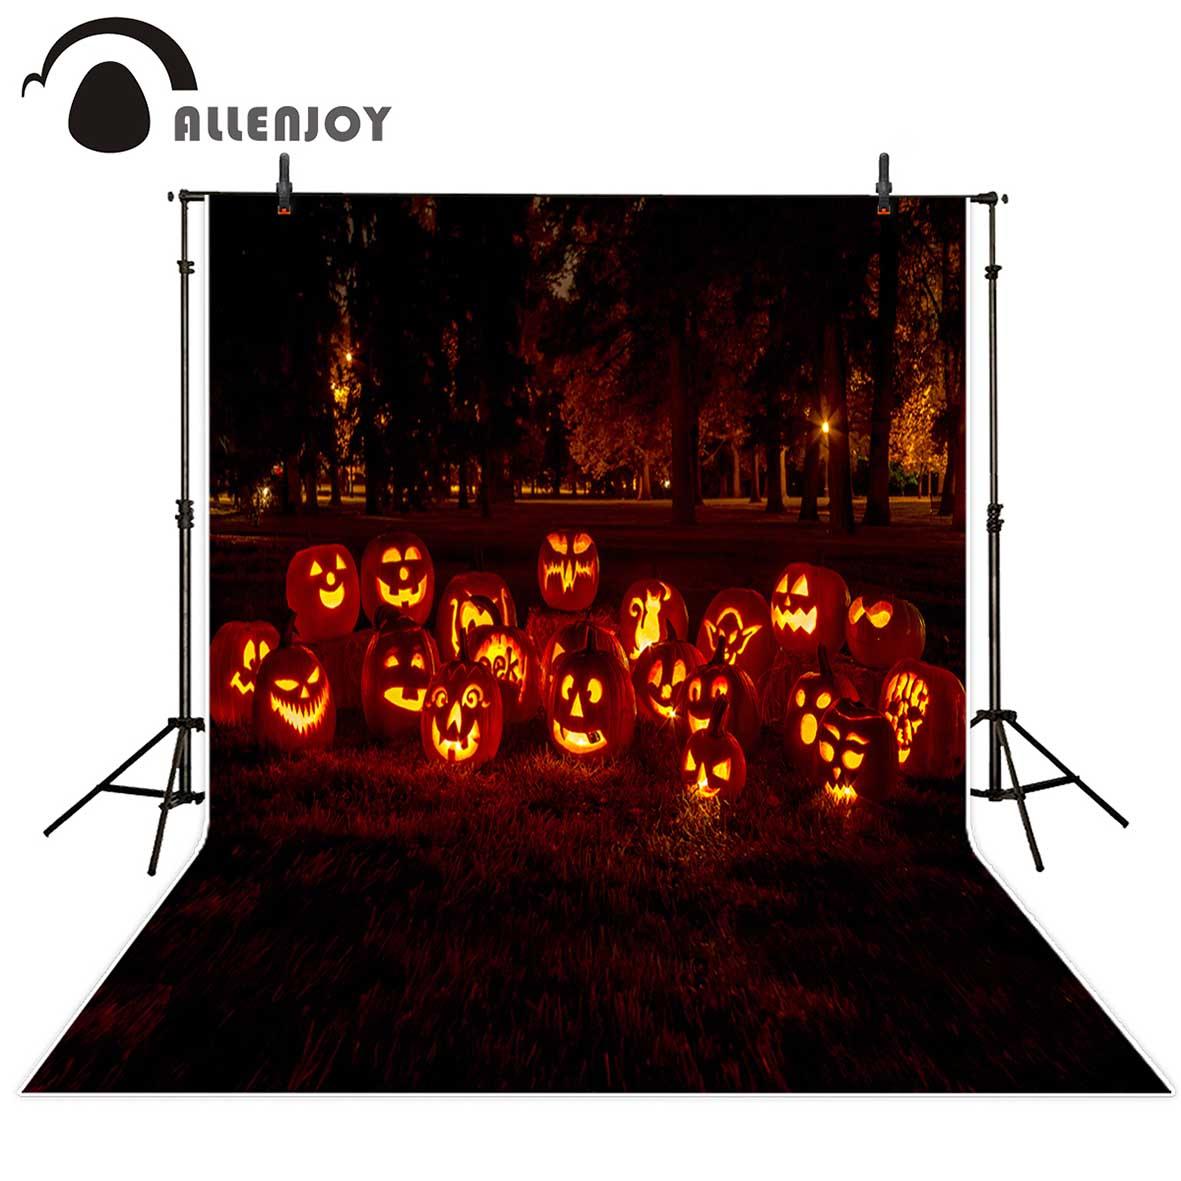 Allenjoy photography backdground Forest night burning pumpkin lights Halloween backdrop newborn original design fantasy props  цена и фото